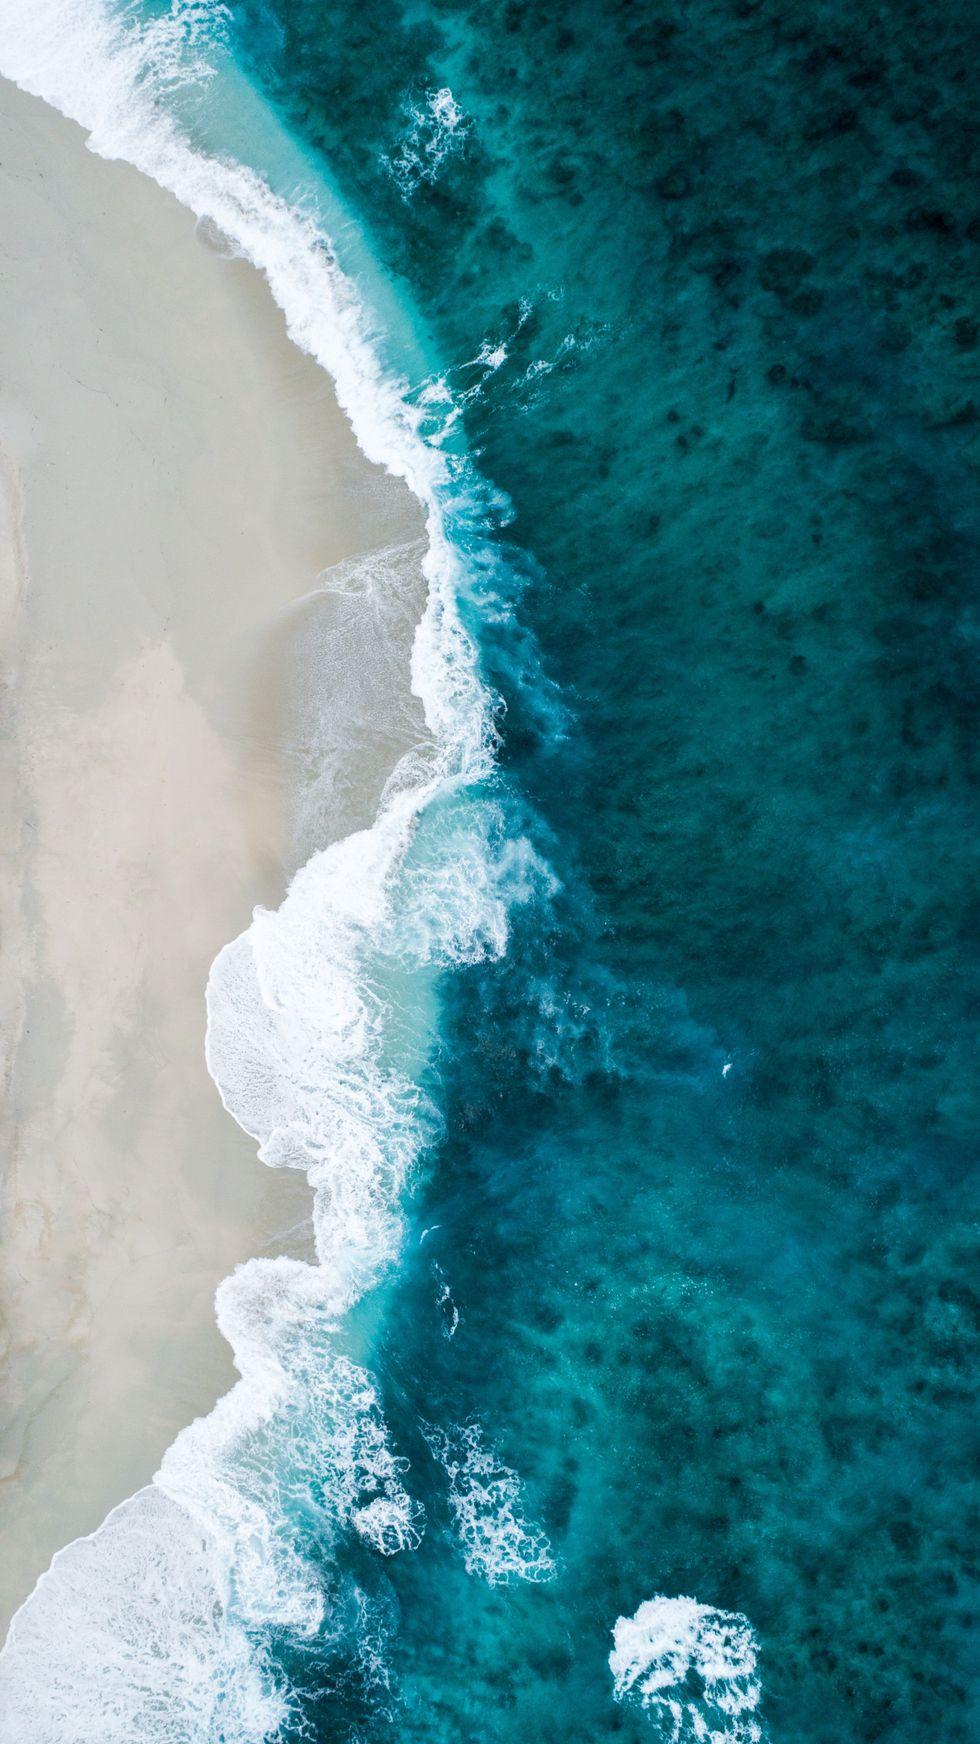 10 Ways To Be Eco-Friendly On Your Next Beach Trip